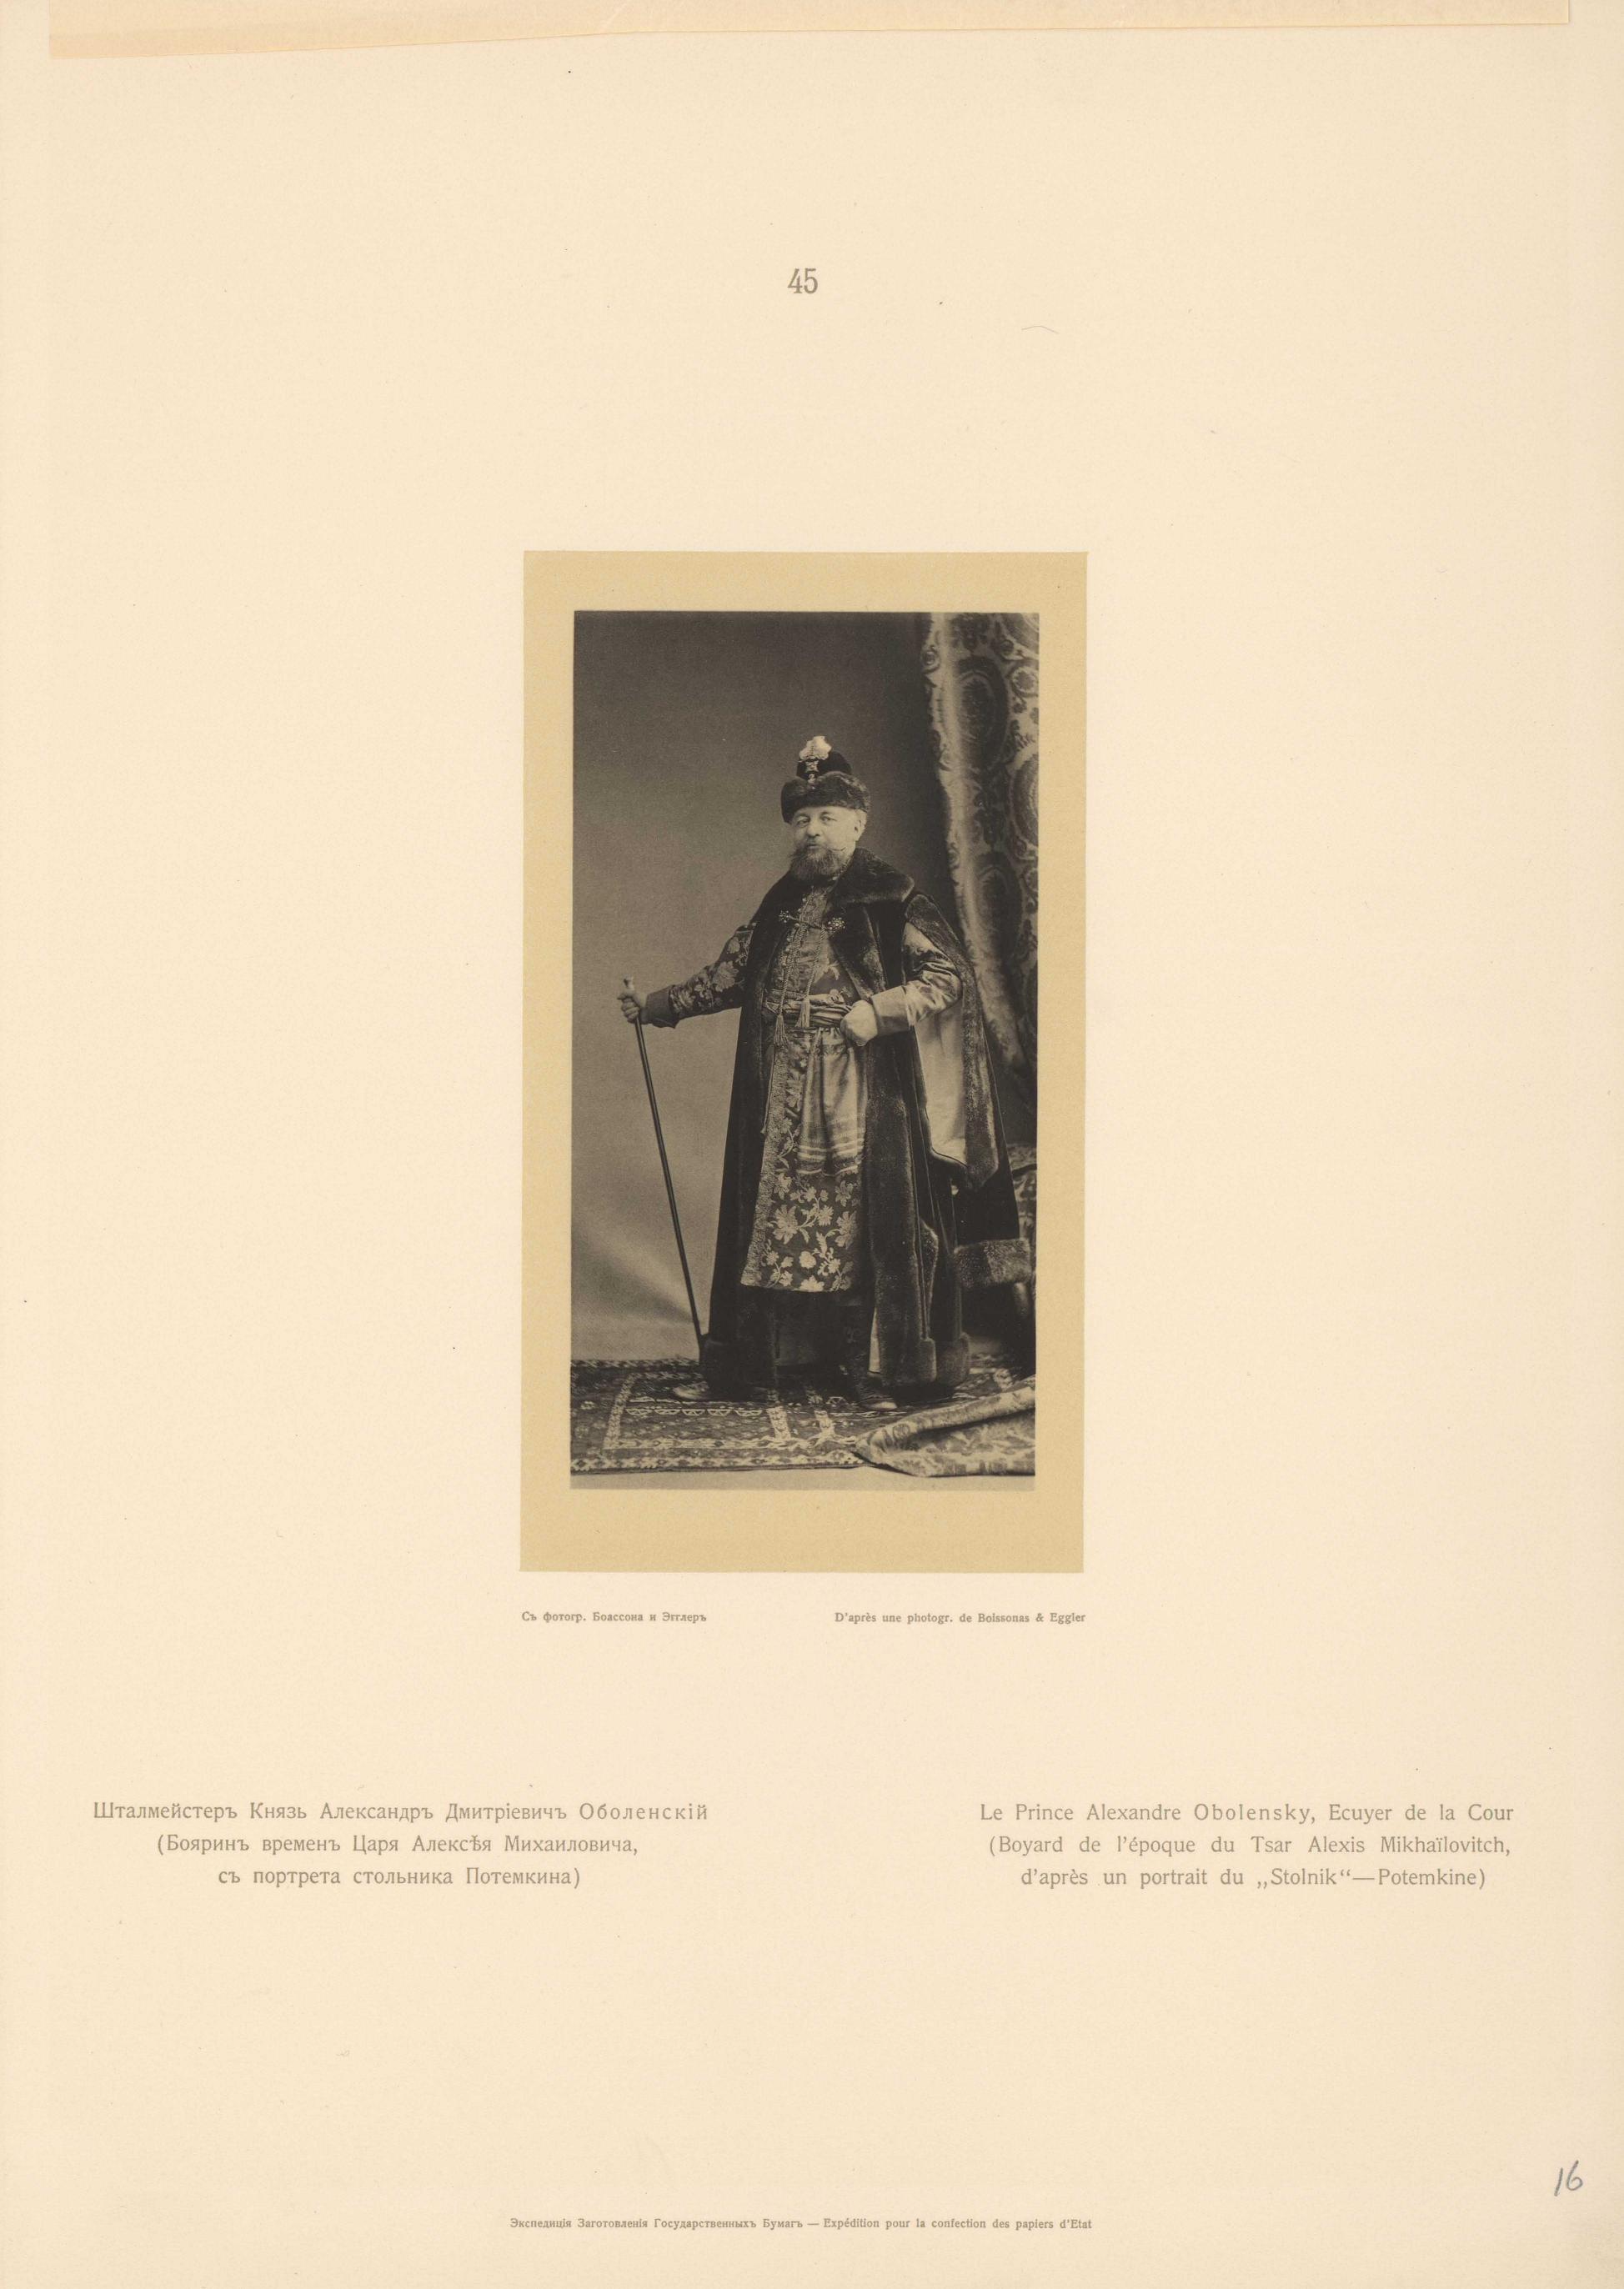 Шталмейстер Князь Александр Дмитриевич Оболенский